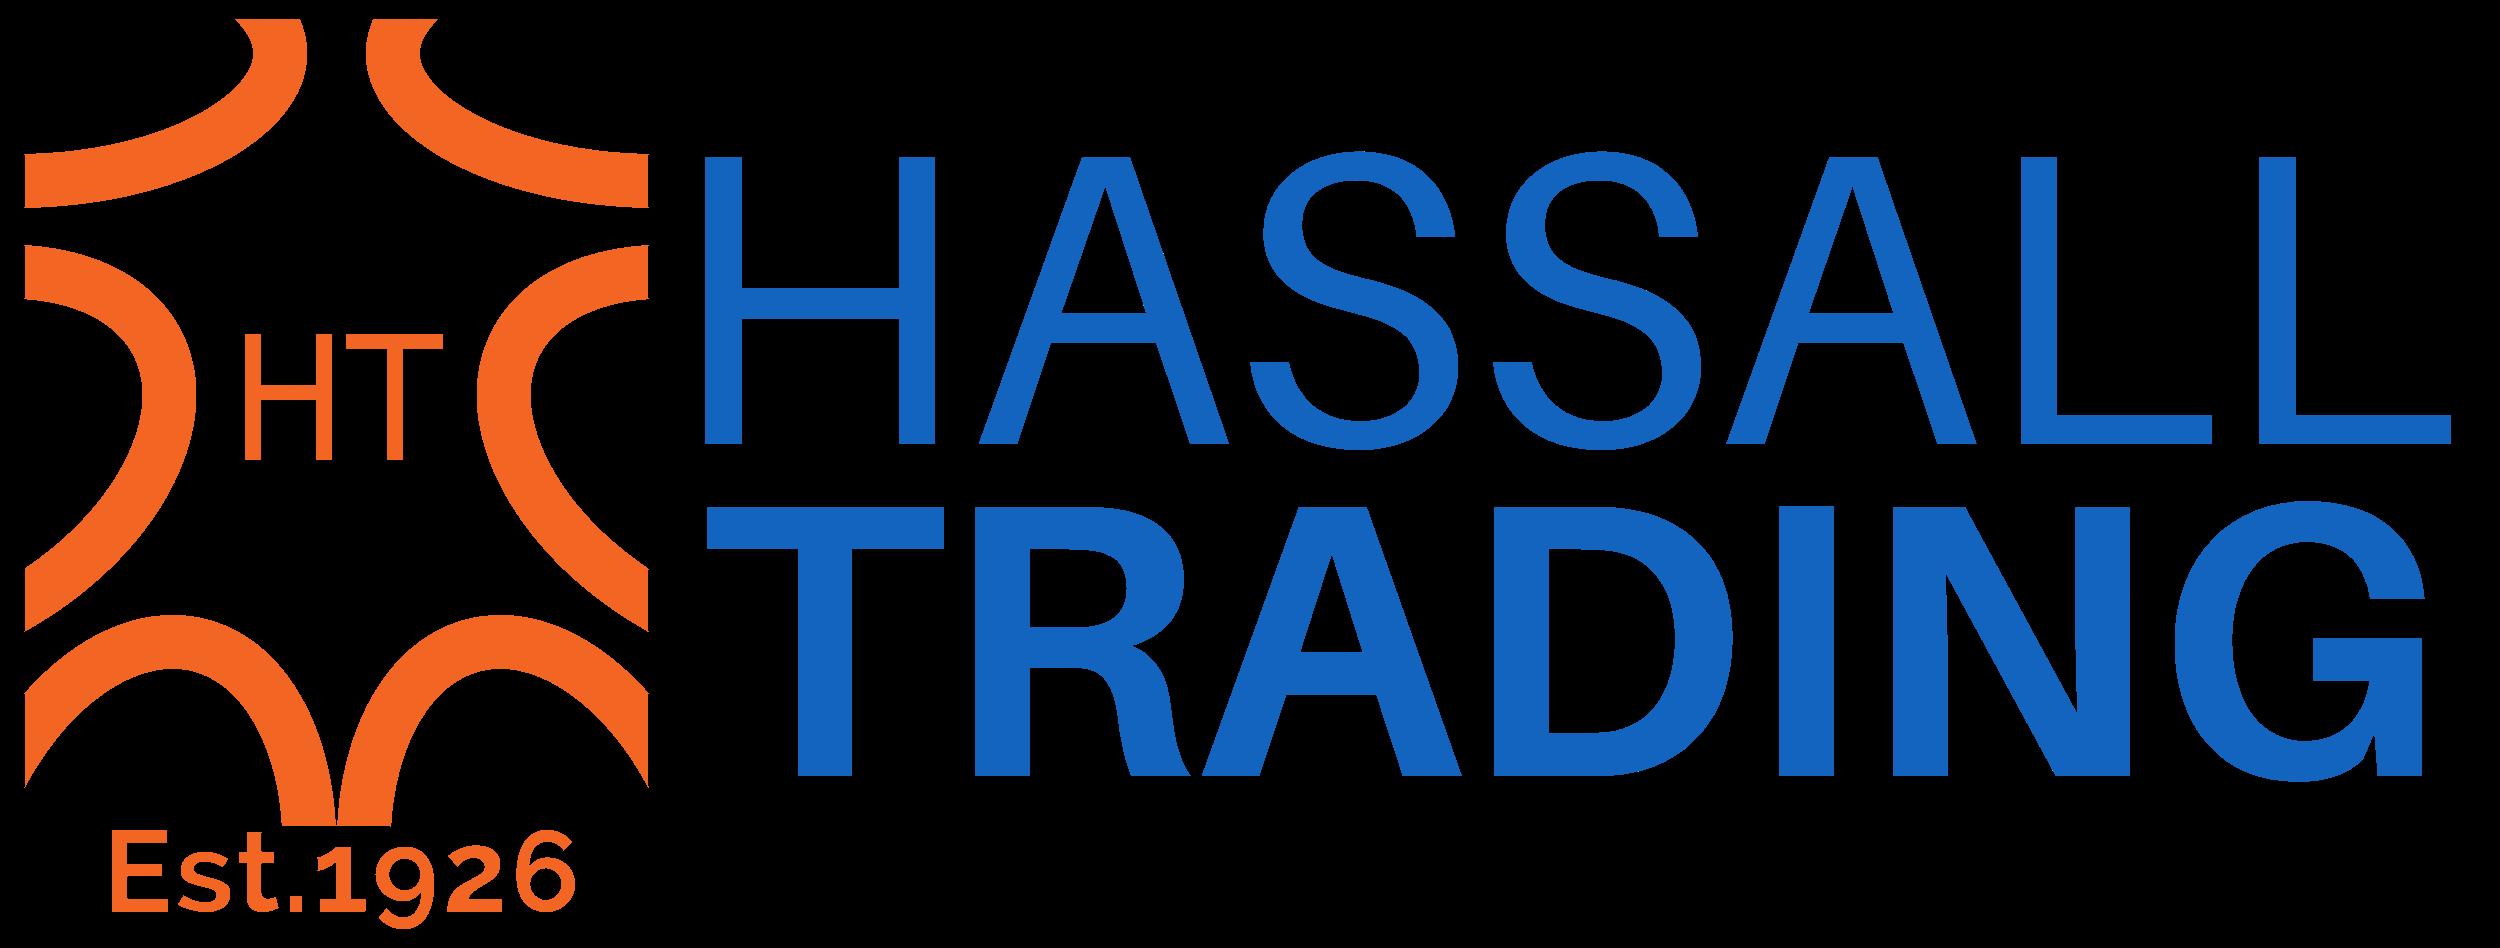 Hassall Trading